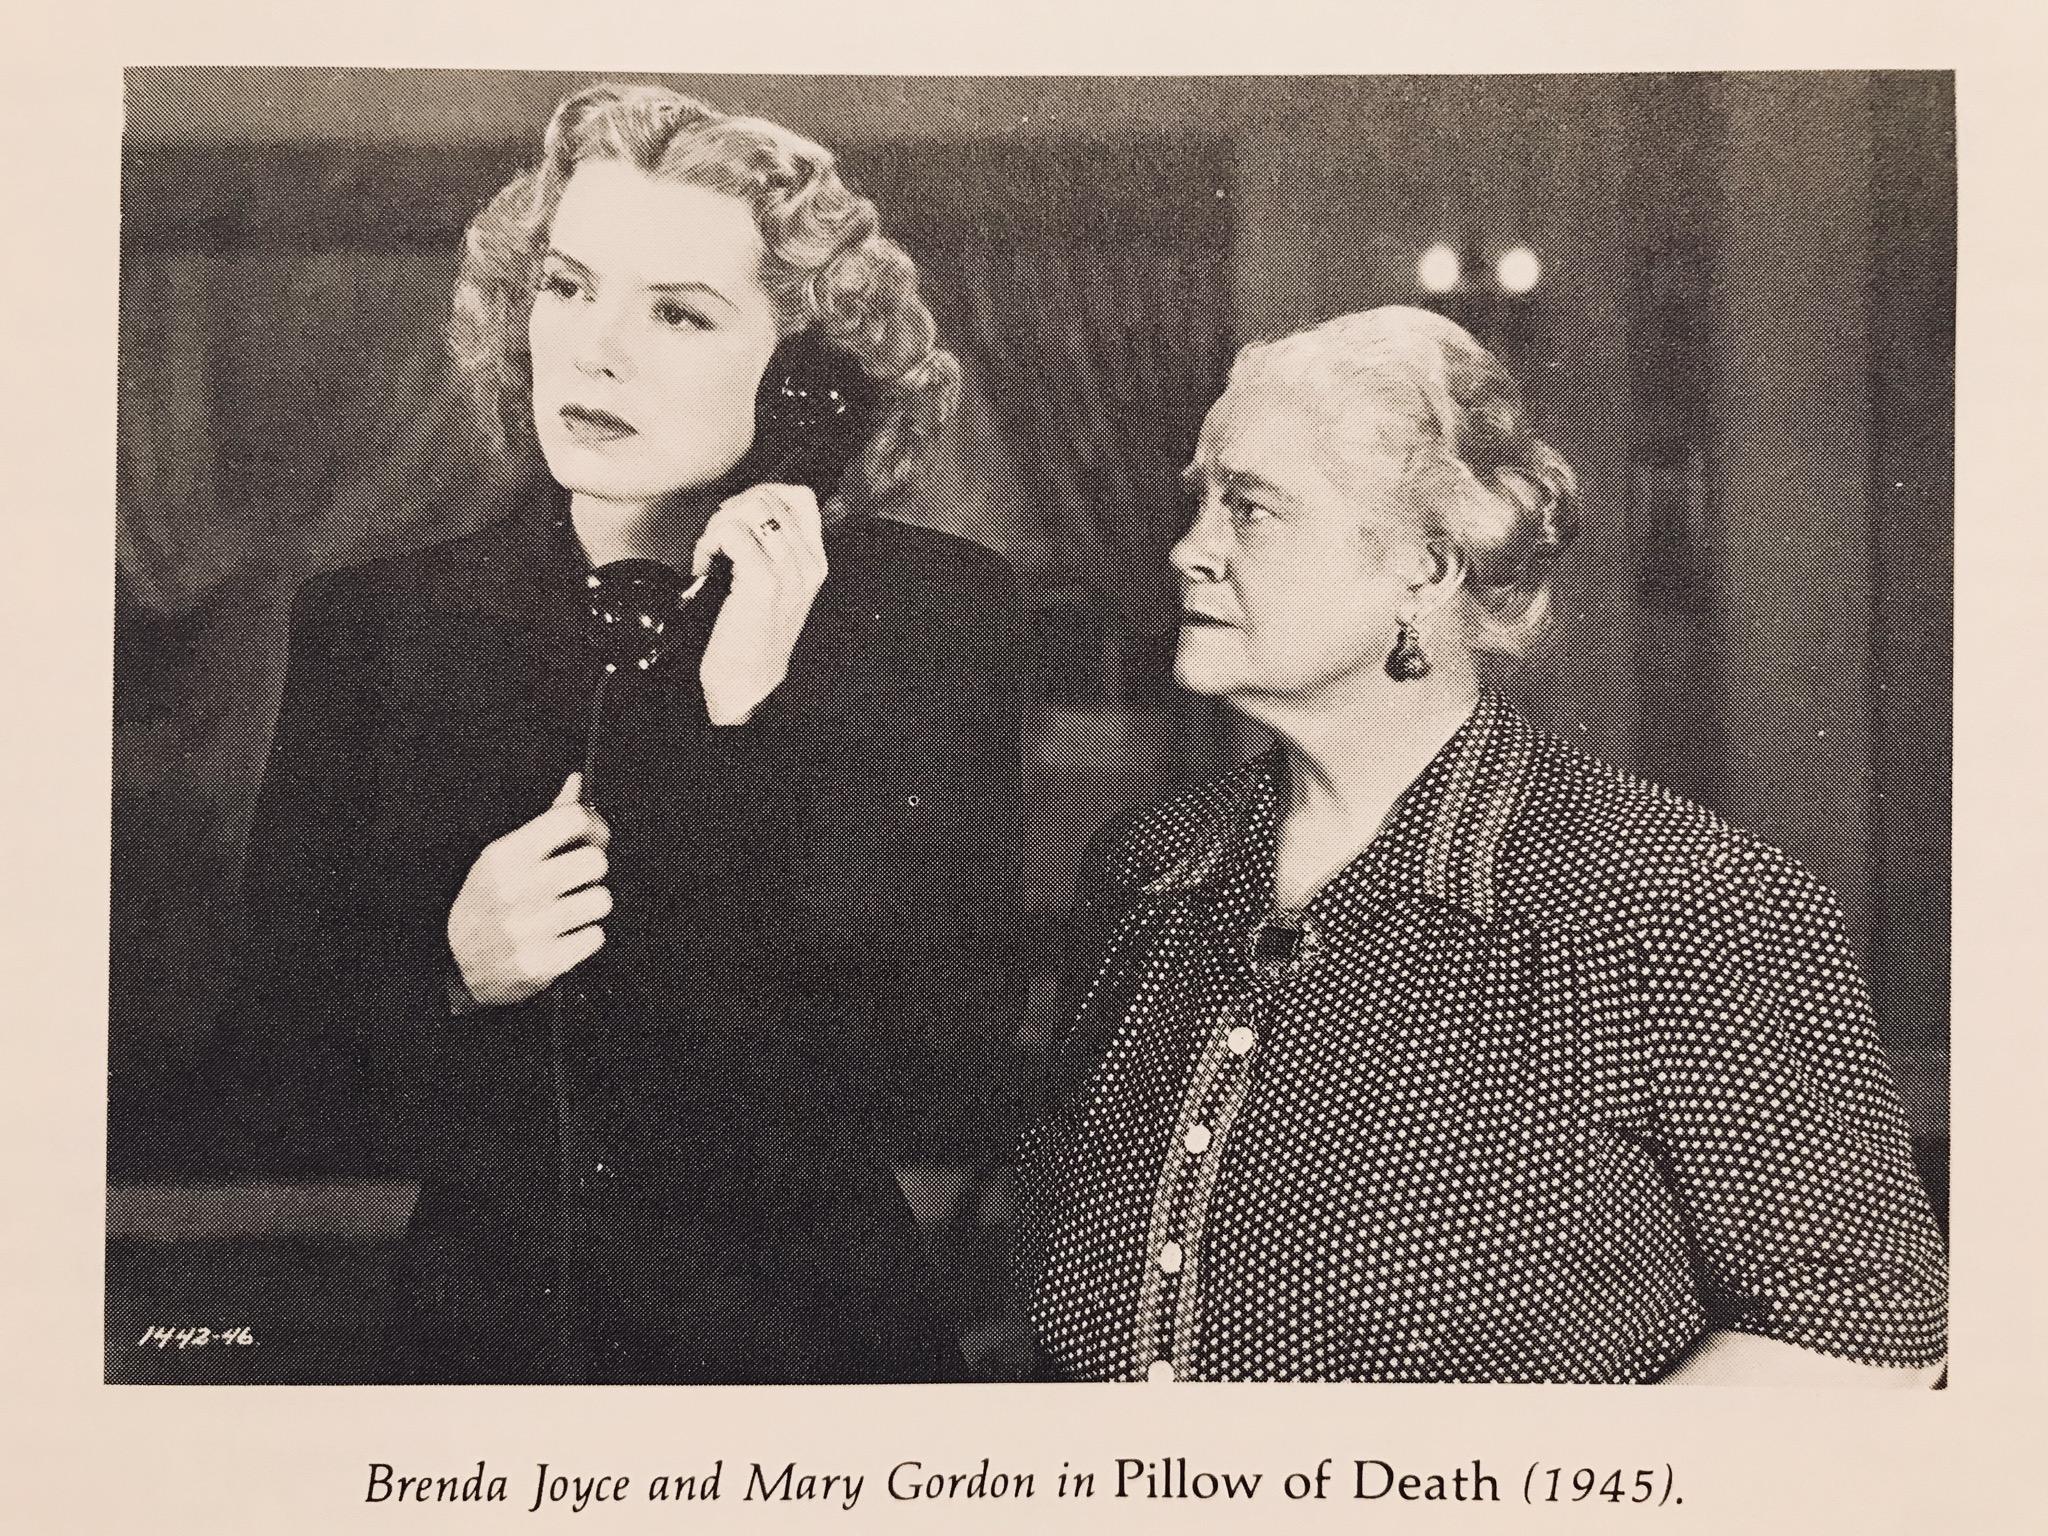 Mary Gordon and Brenda Joyce in Pillow of Death (1945)